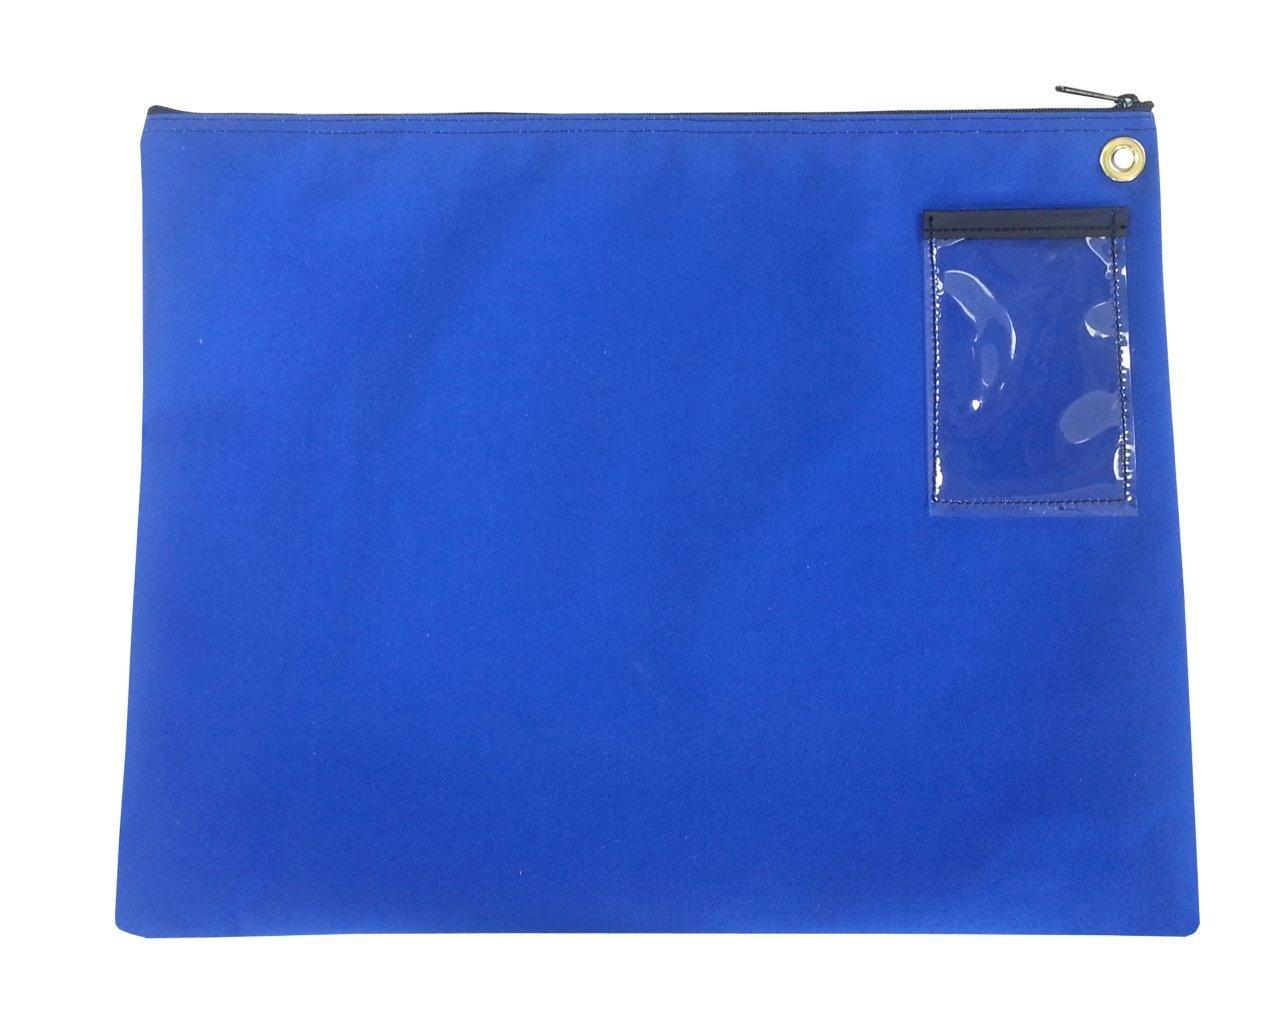 Interoffice Mailer Canvas Transit Sack Zipper Bag 18w x 14h Royal Blue